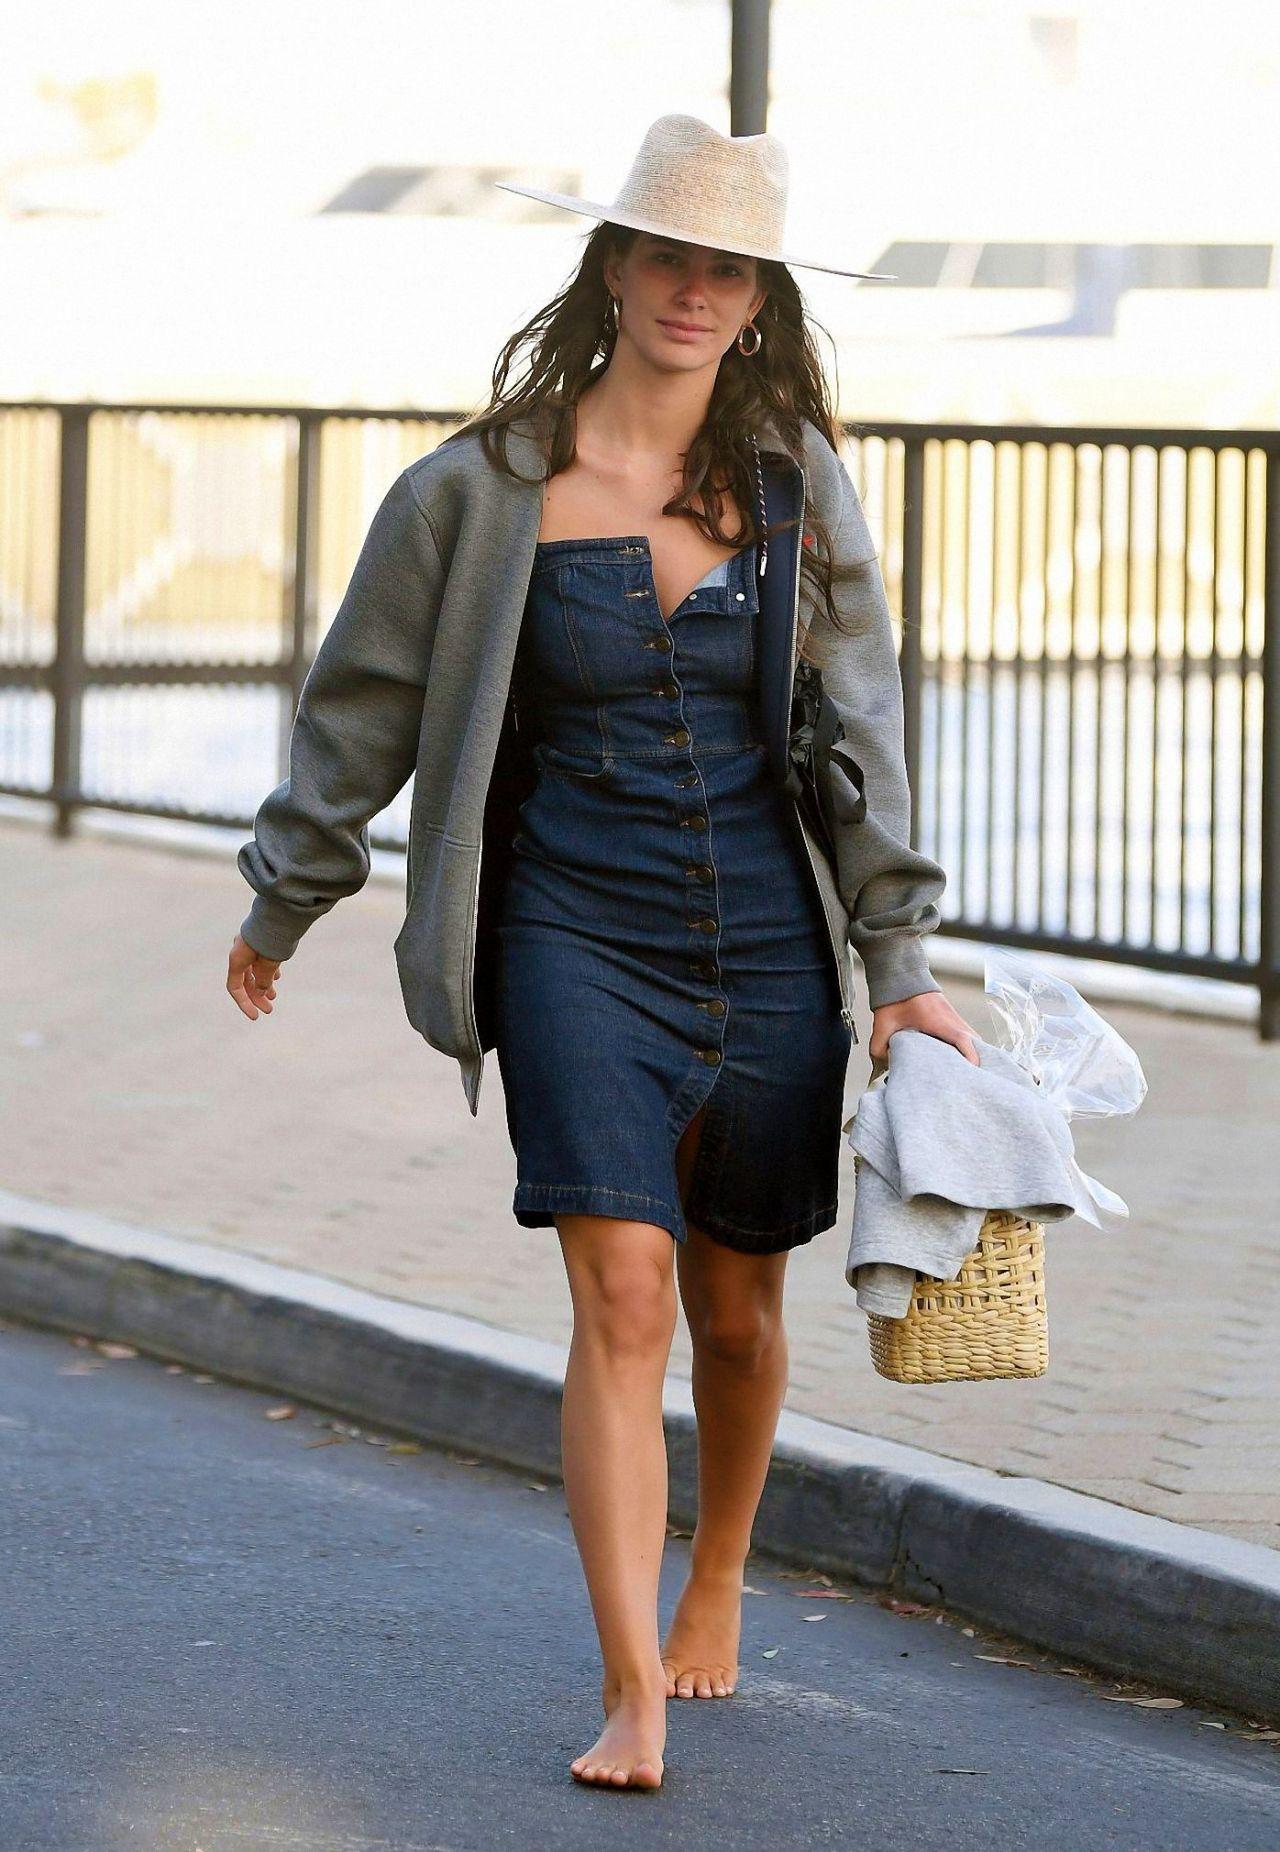 卡米拉·莫罗内(Camila Morrone)–抵达玛丽娜·德雷(Marina Del Rey